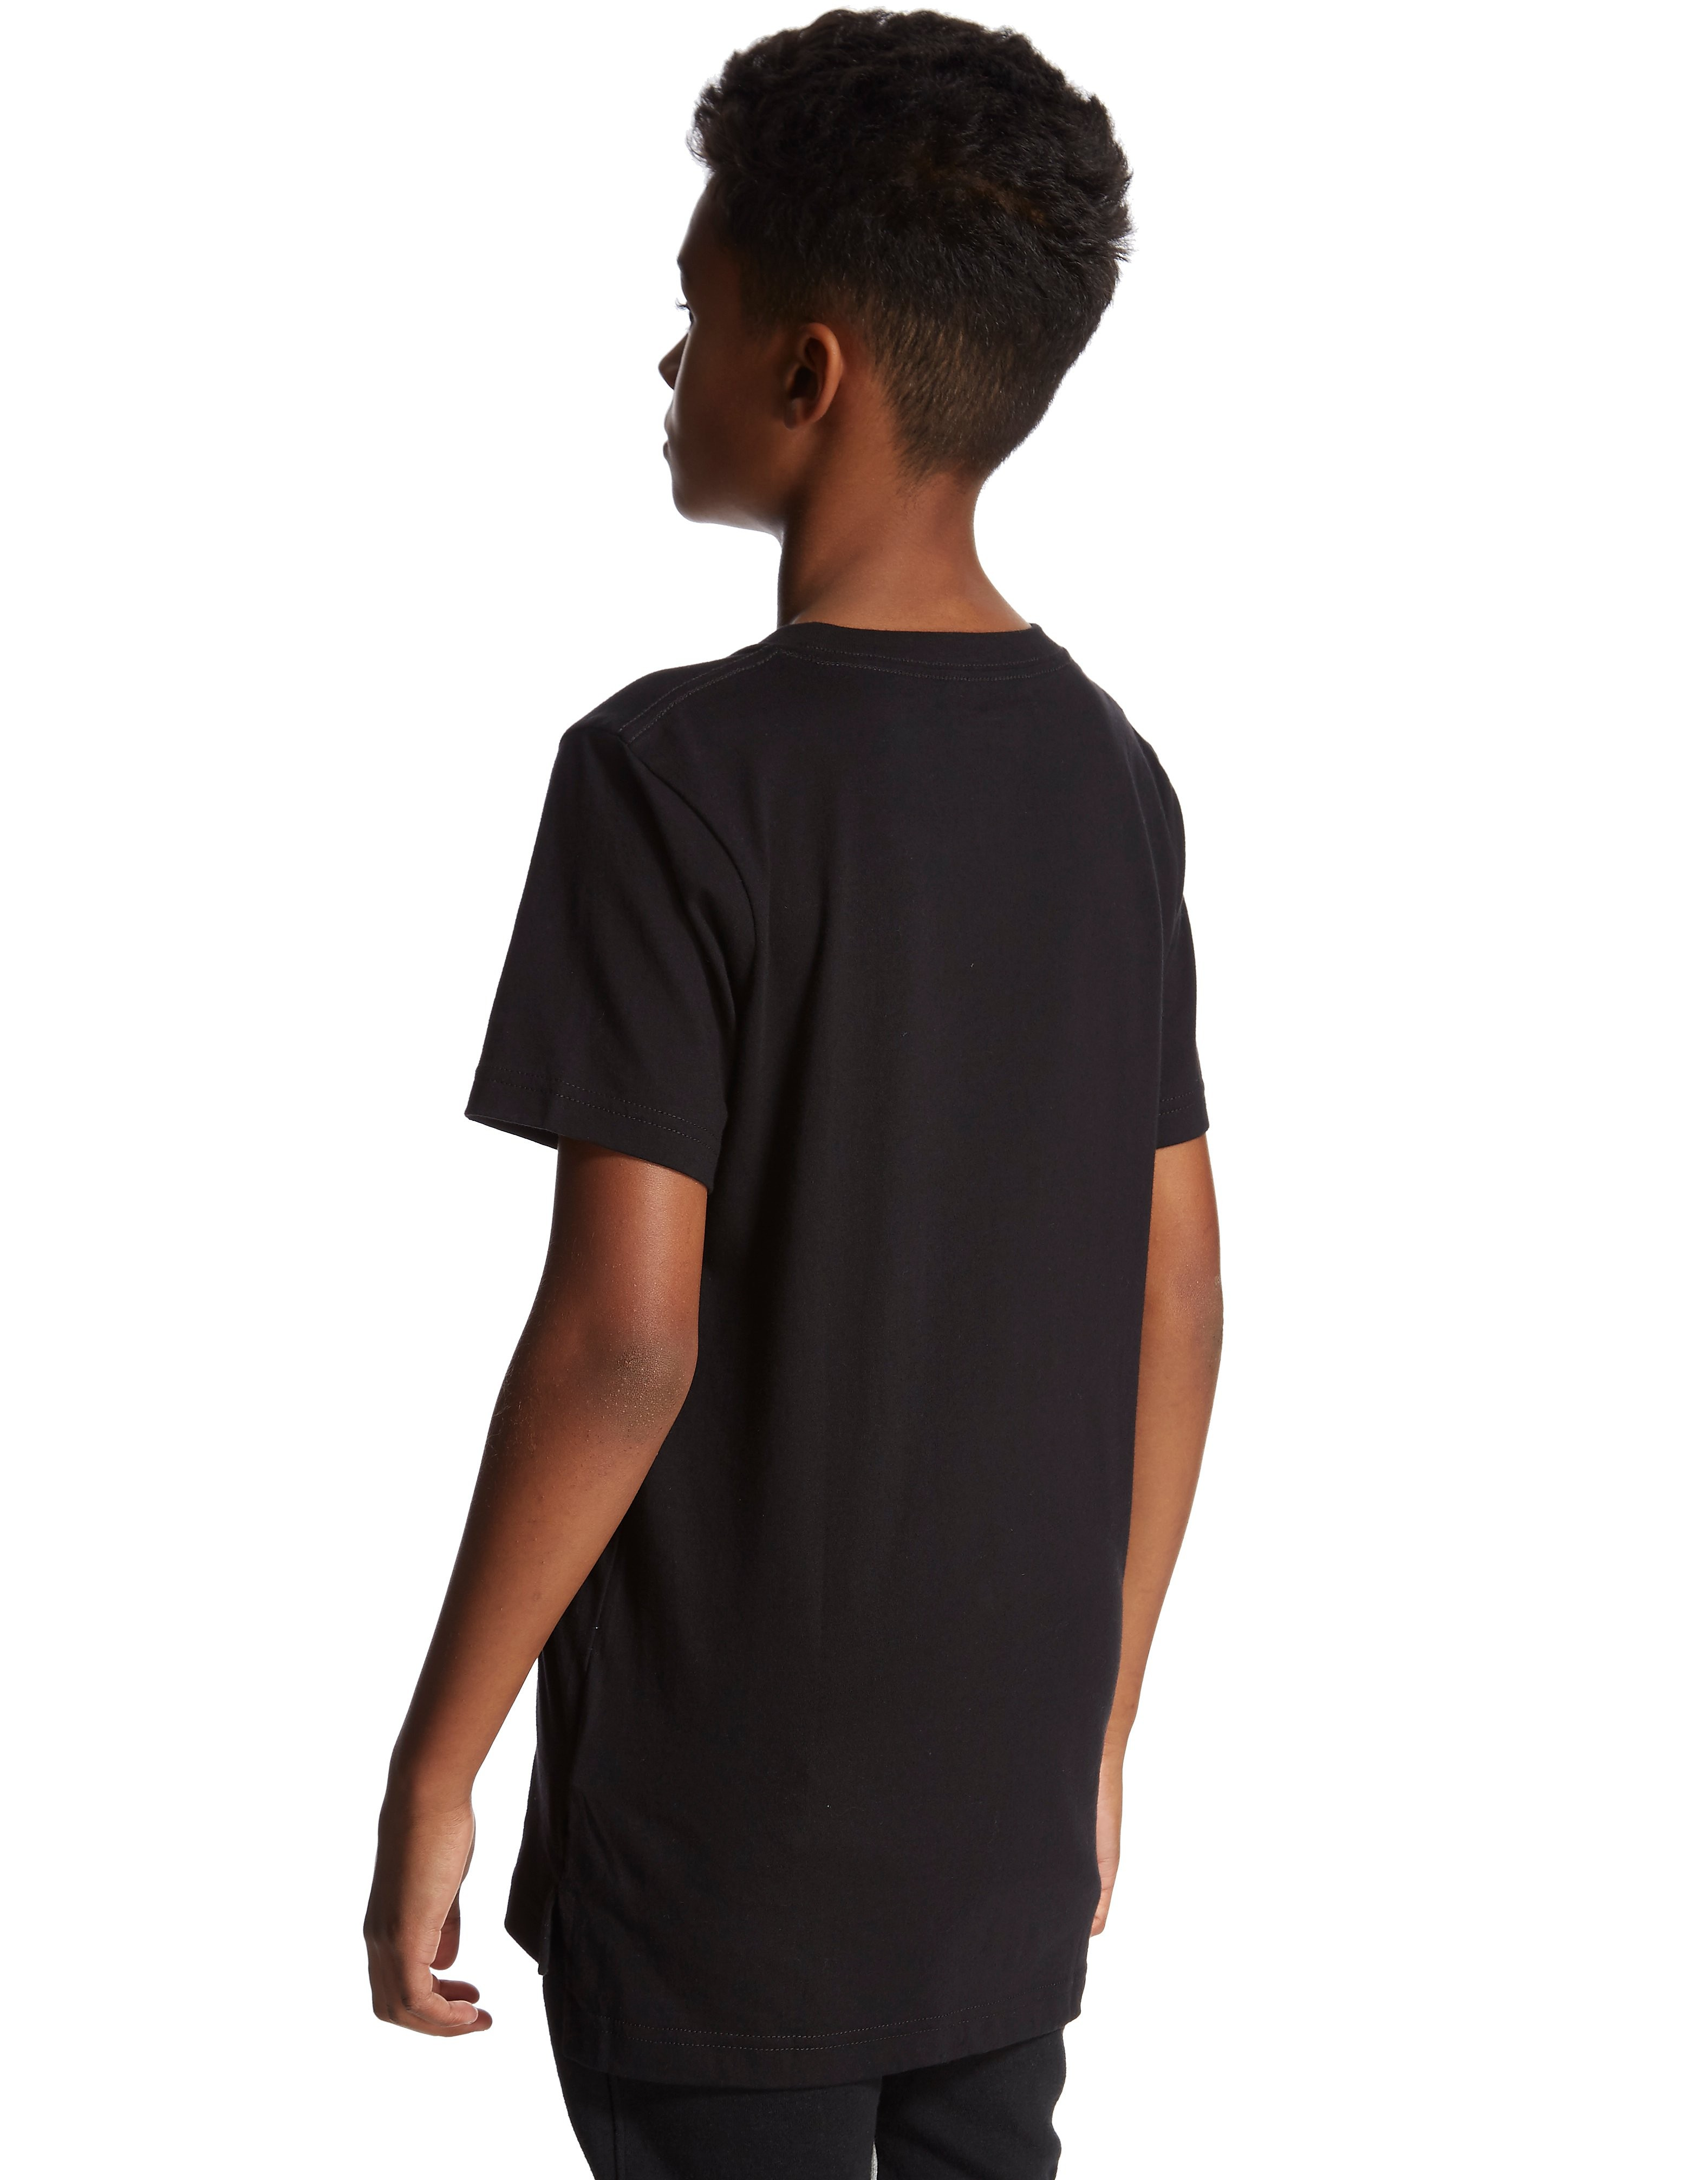 Jordan Extended T-Shirt Junior